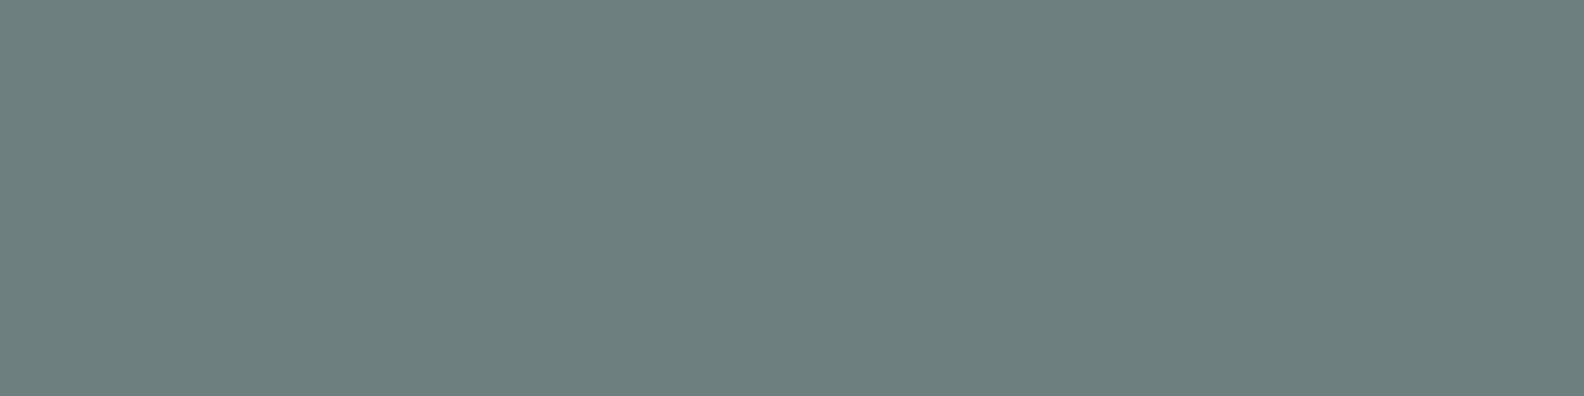 1584x396 AuroMetalSaurus Solid Color Background